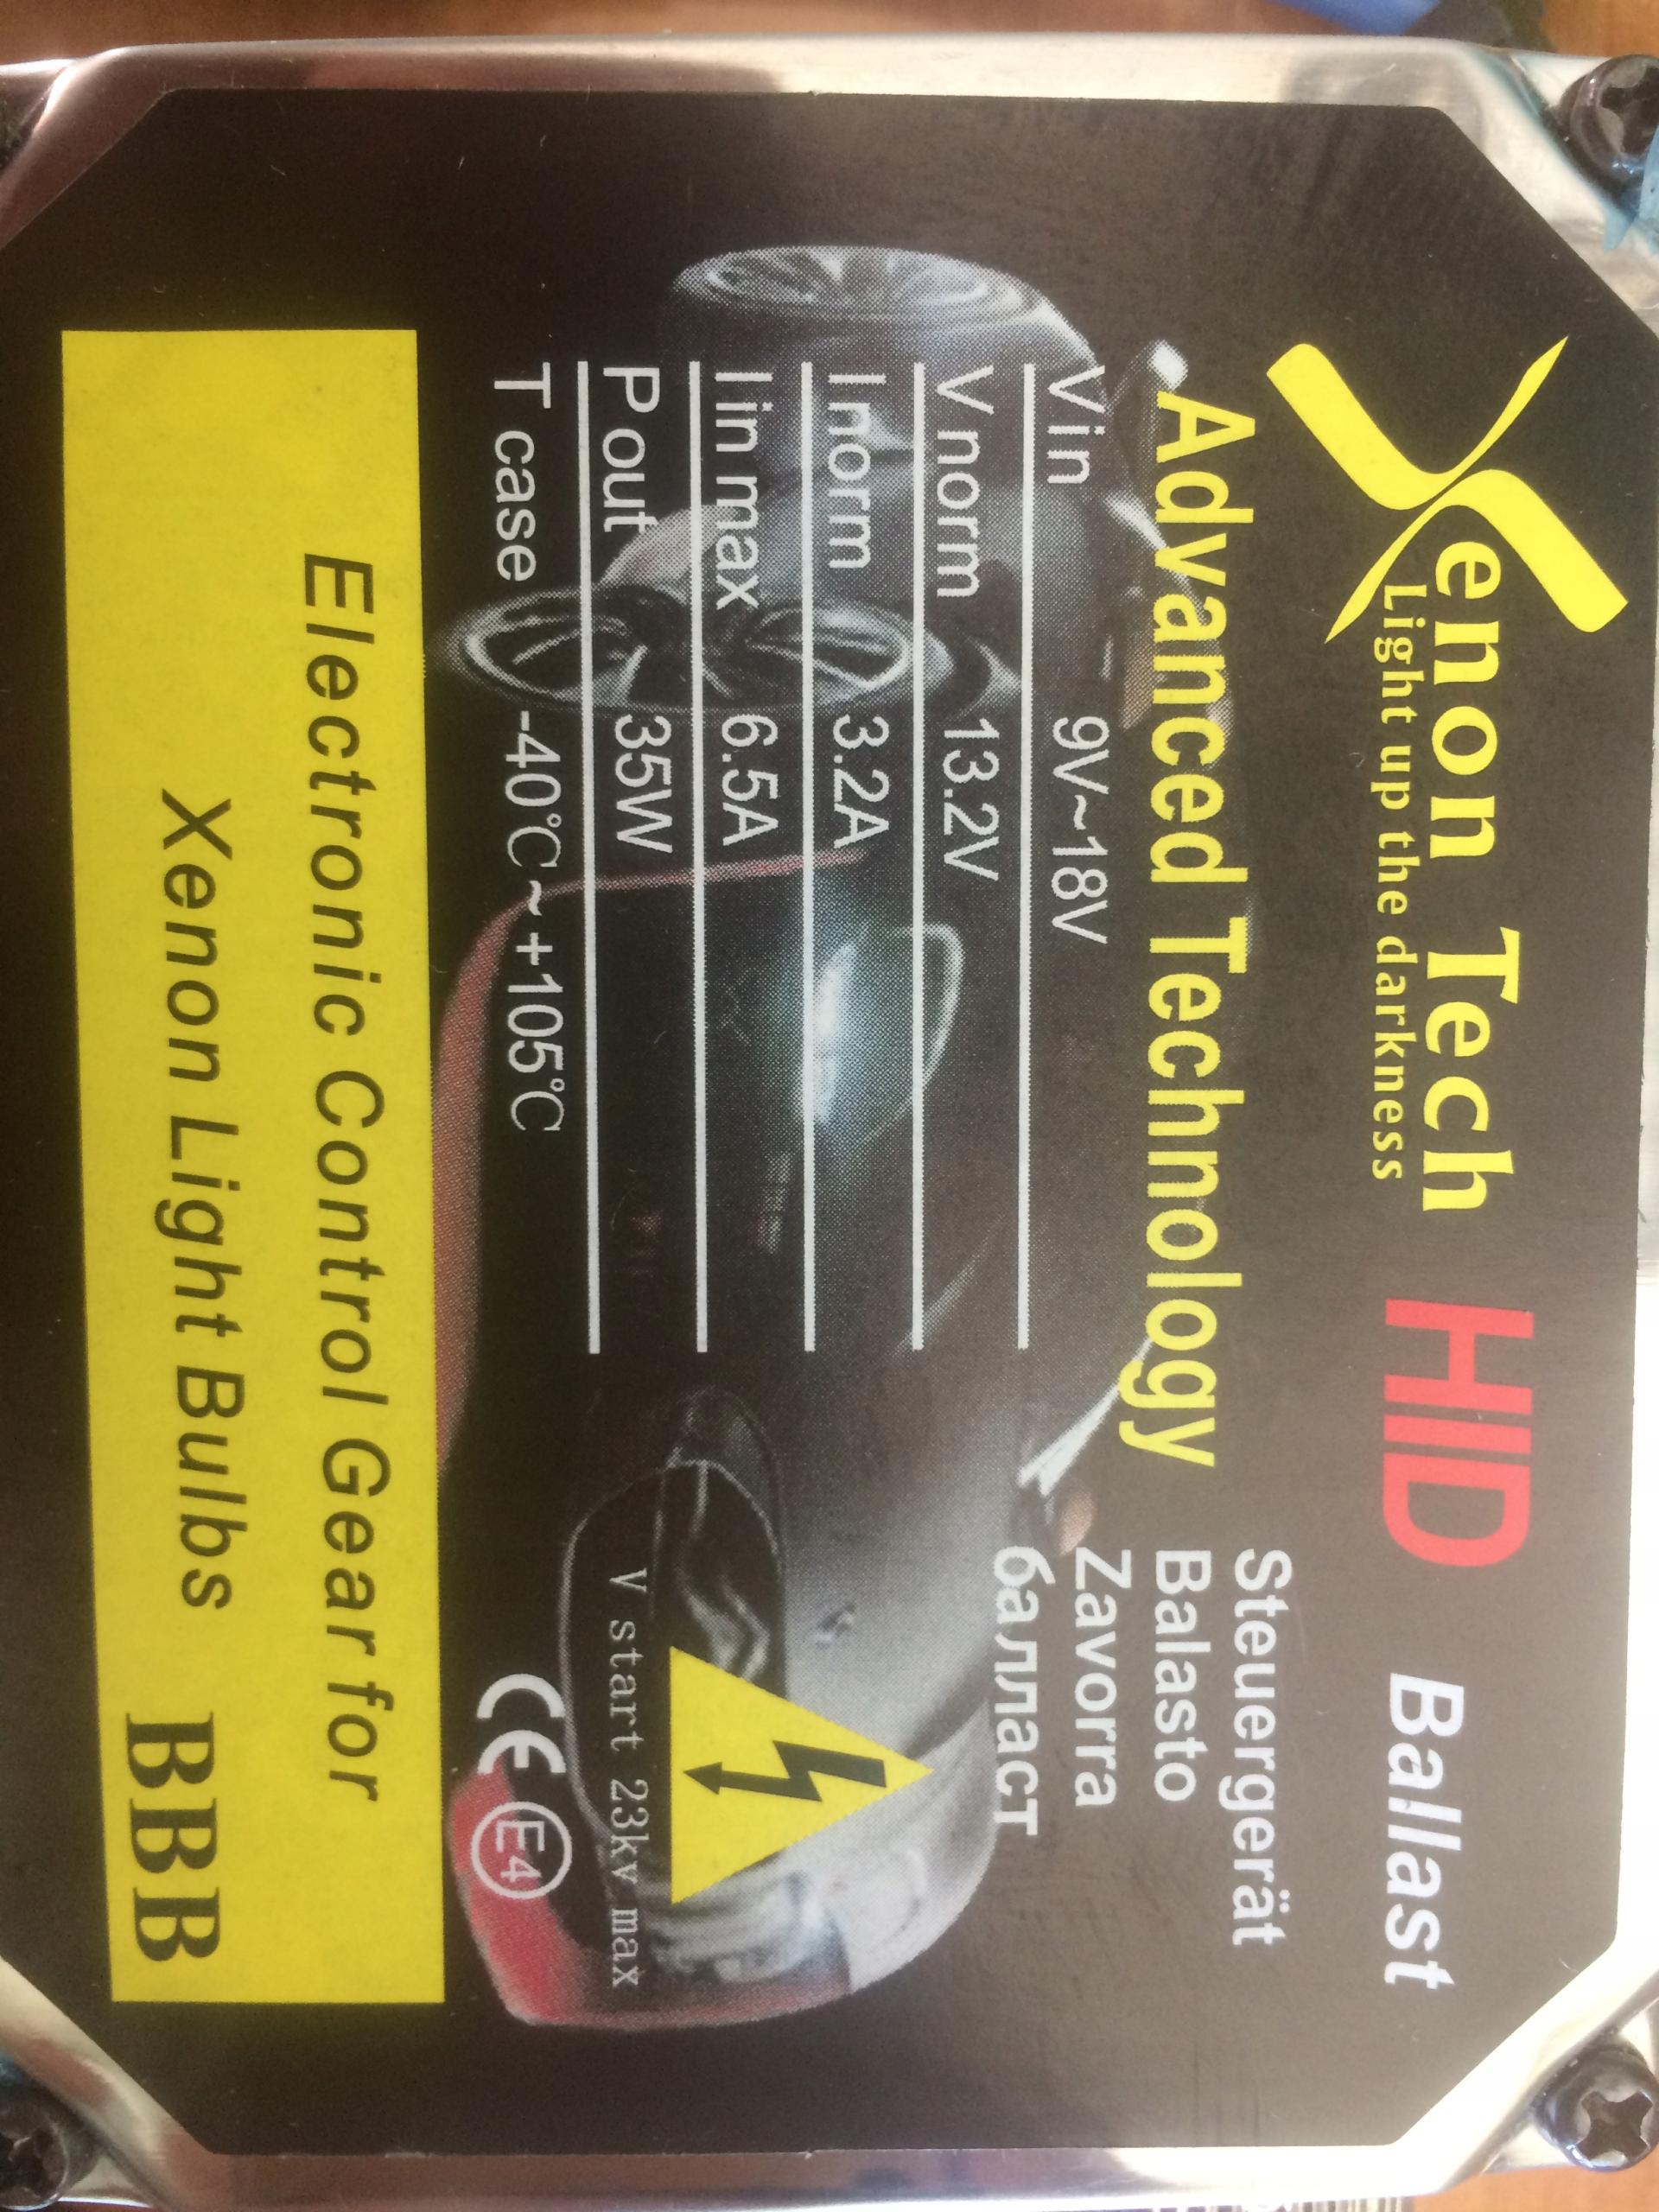 ПРЕОБРАЗОВАТЕЛЬ XENON HID H1 H3 H4 H7 H11 КСЕНОН